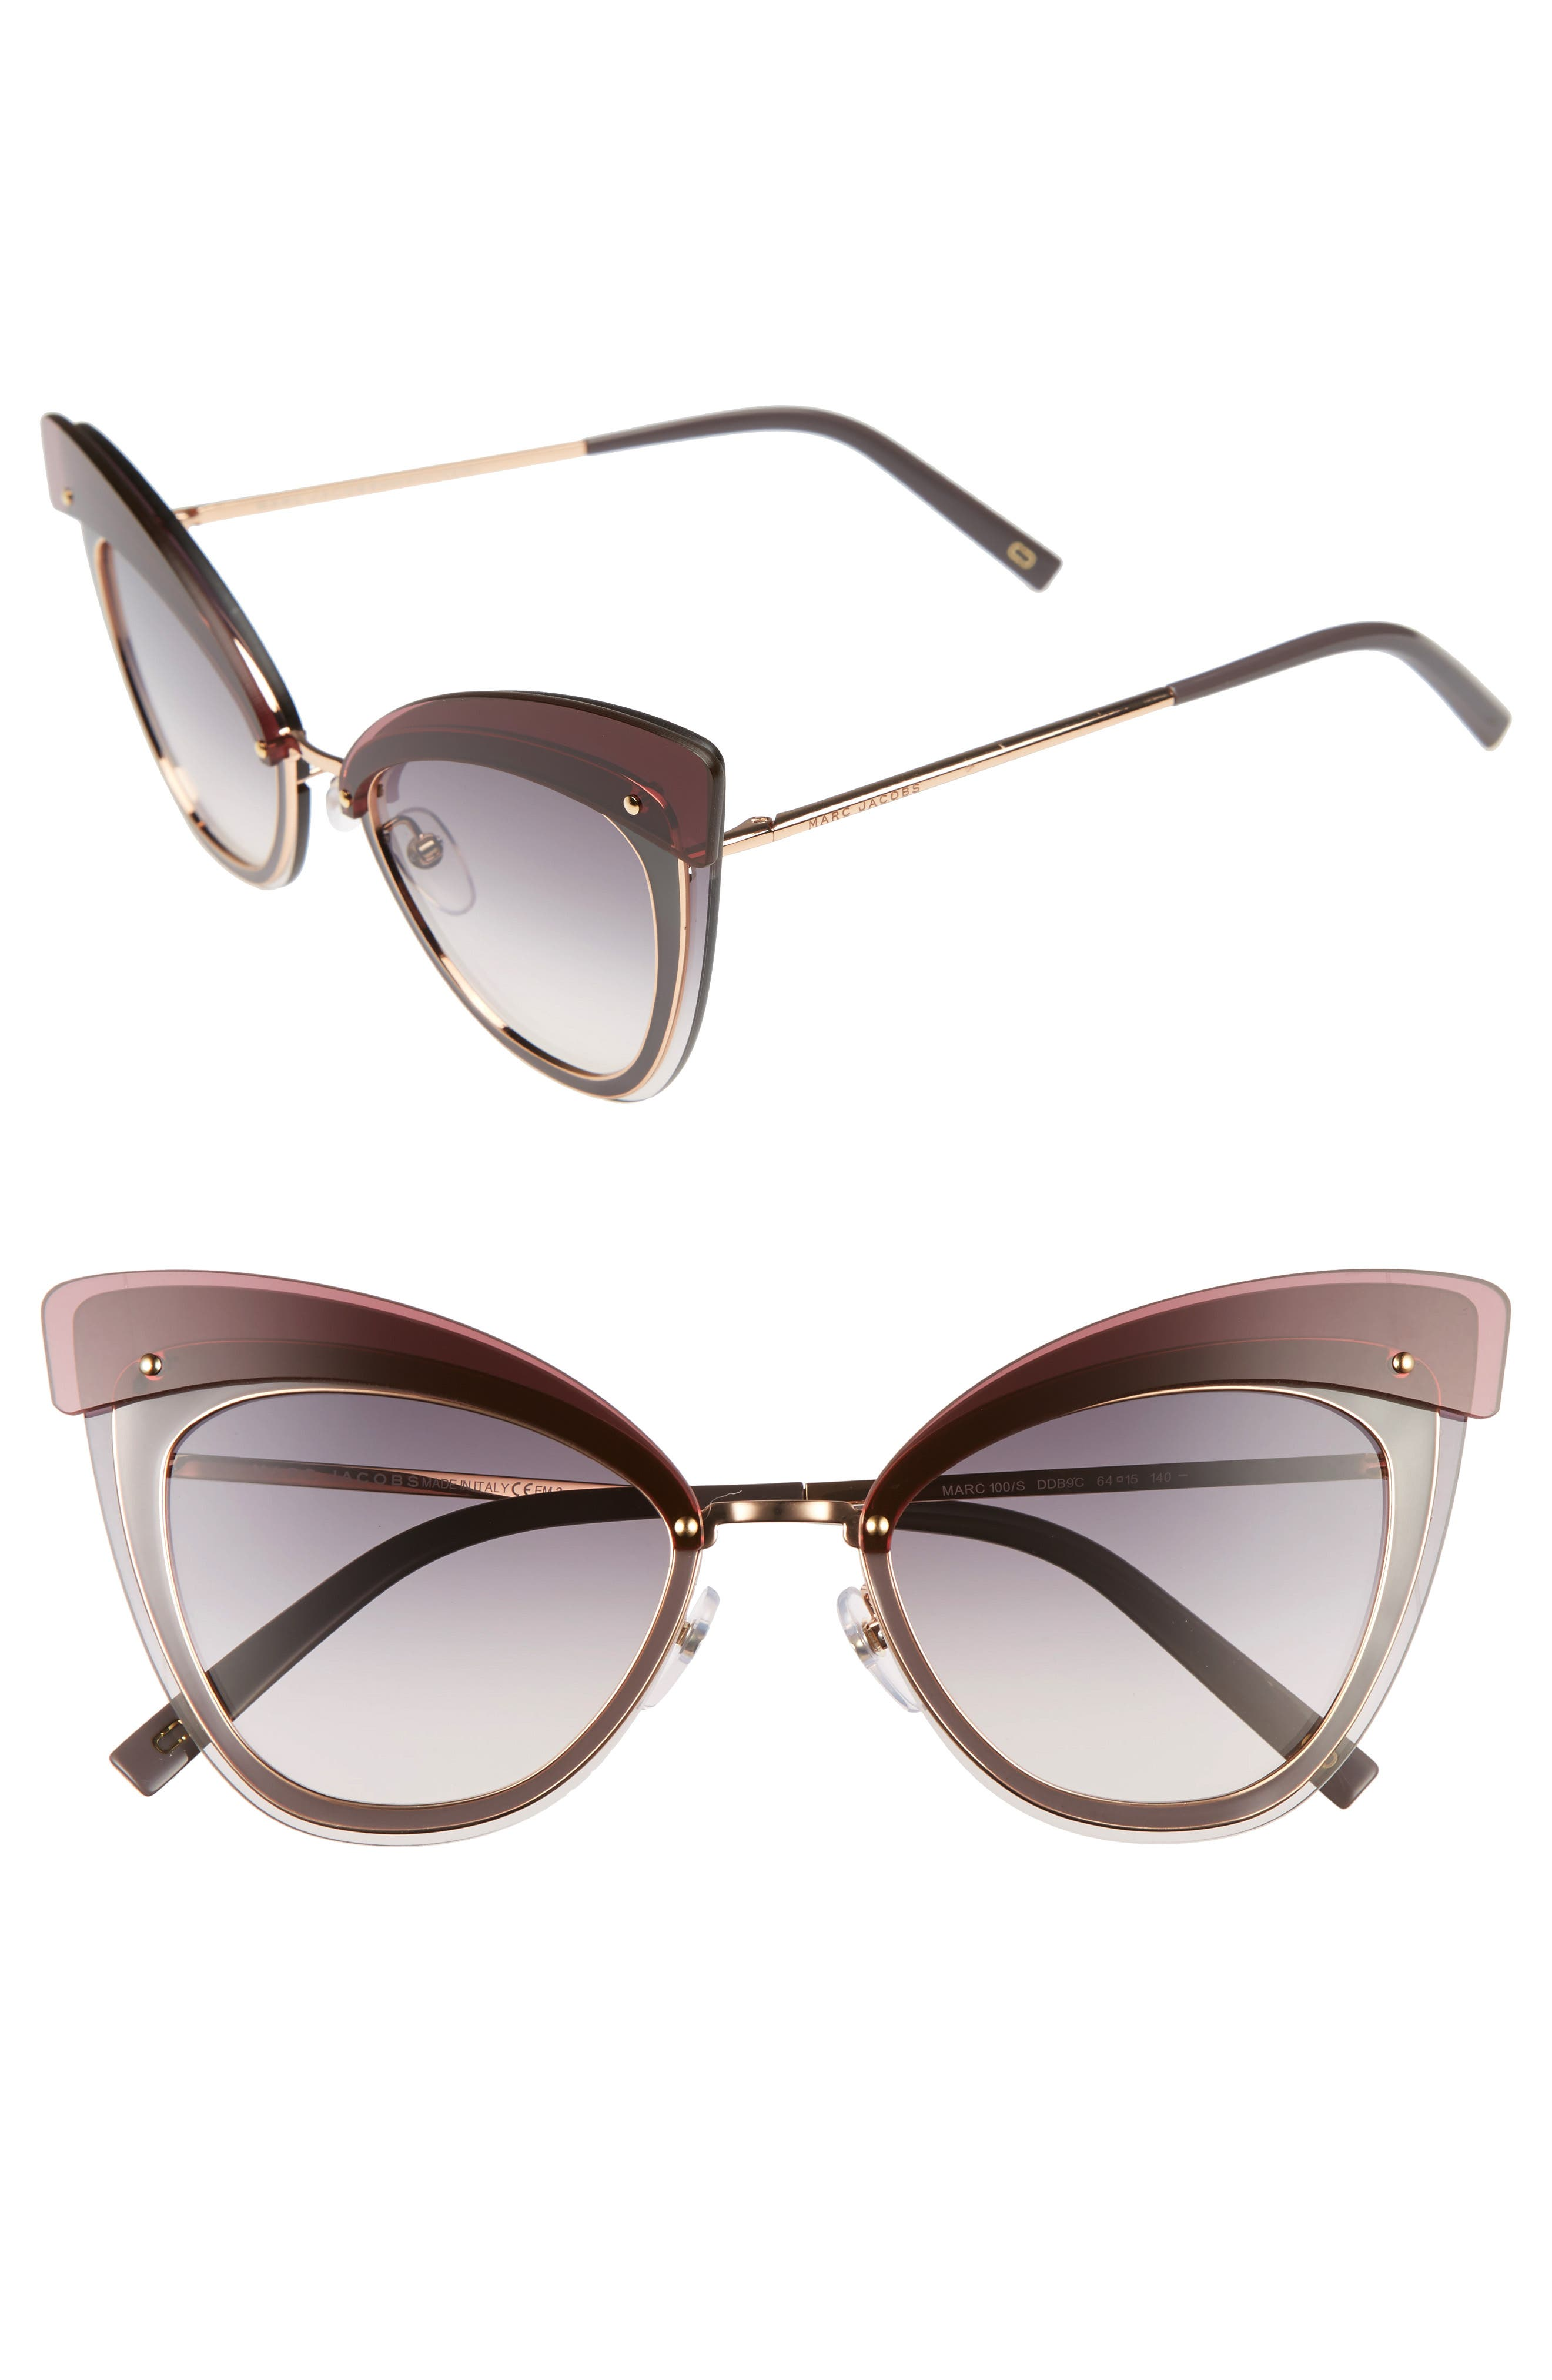 64mm Sunglasses,                             Alternate thumbnail 5, color,